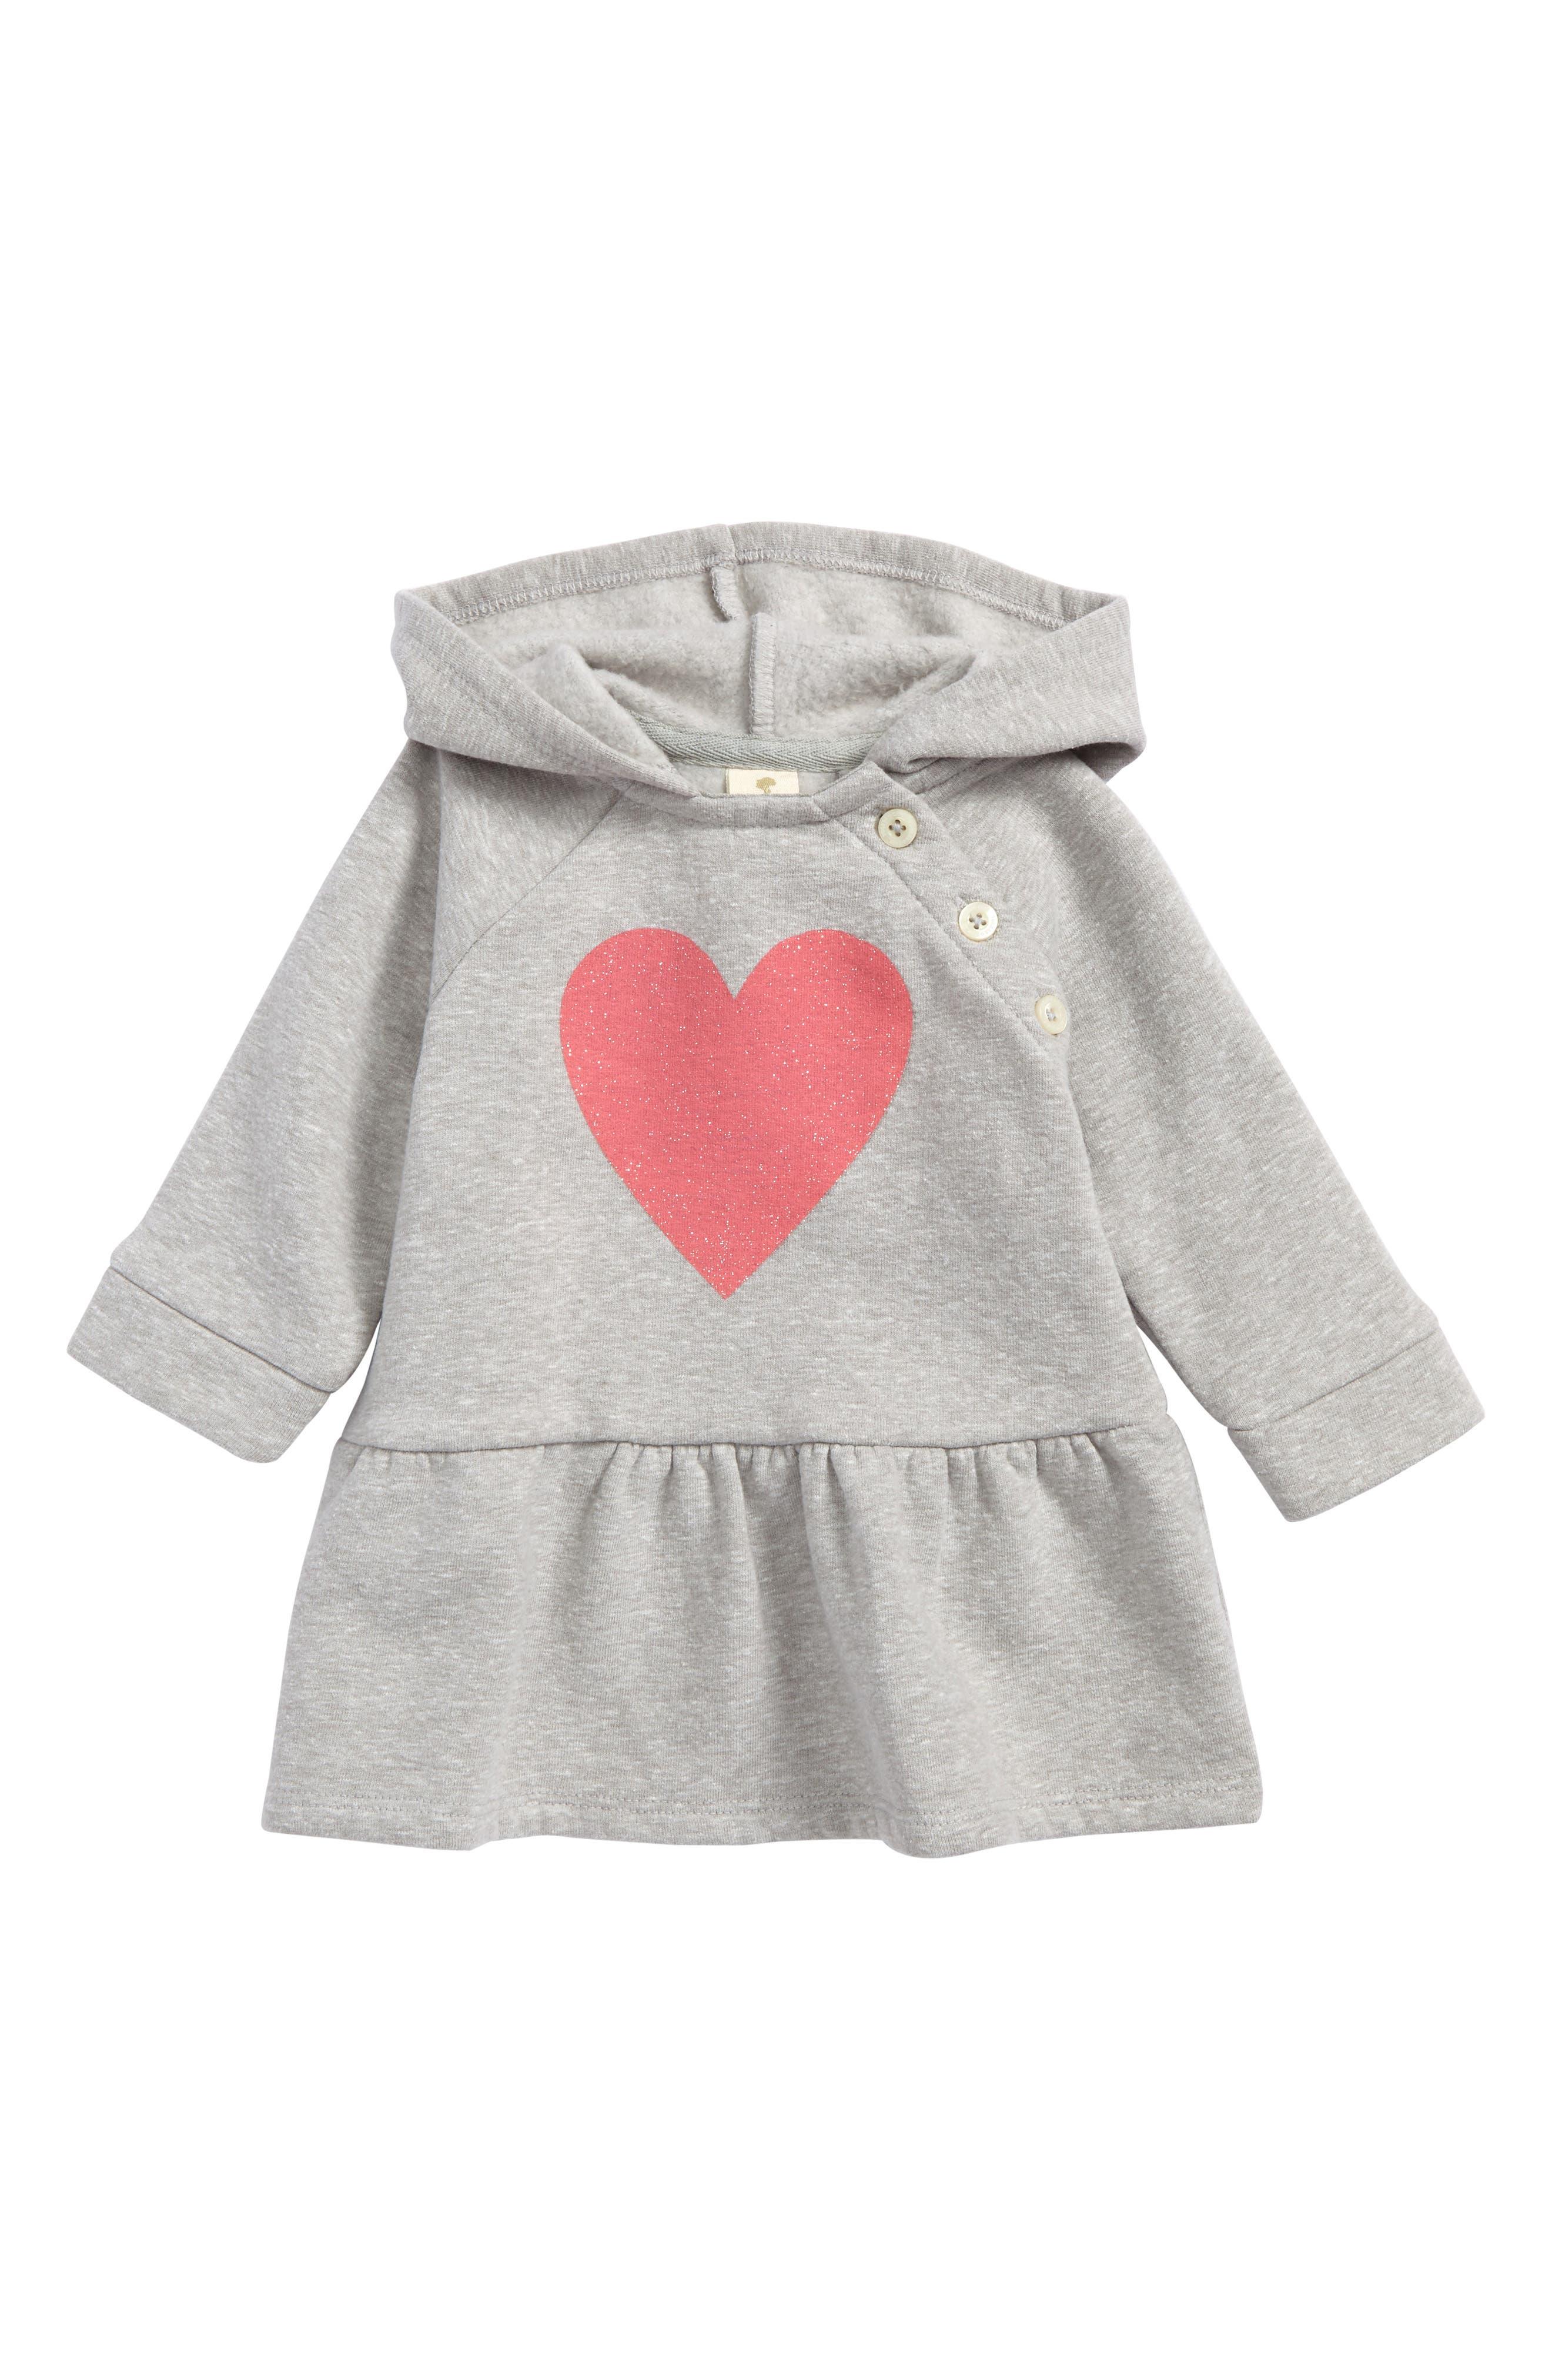 Tucker + Tate Sparkle Heart Hooded Fleece Dress (Baby Girls)